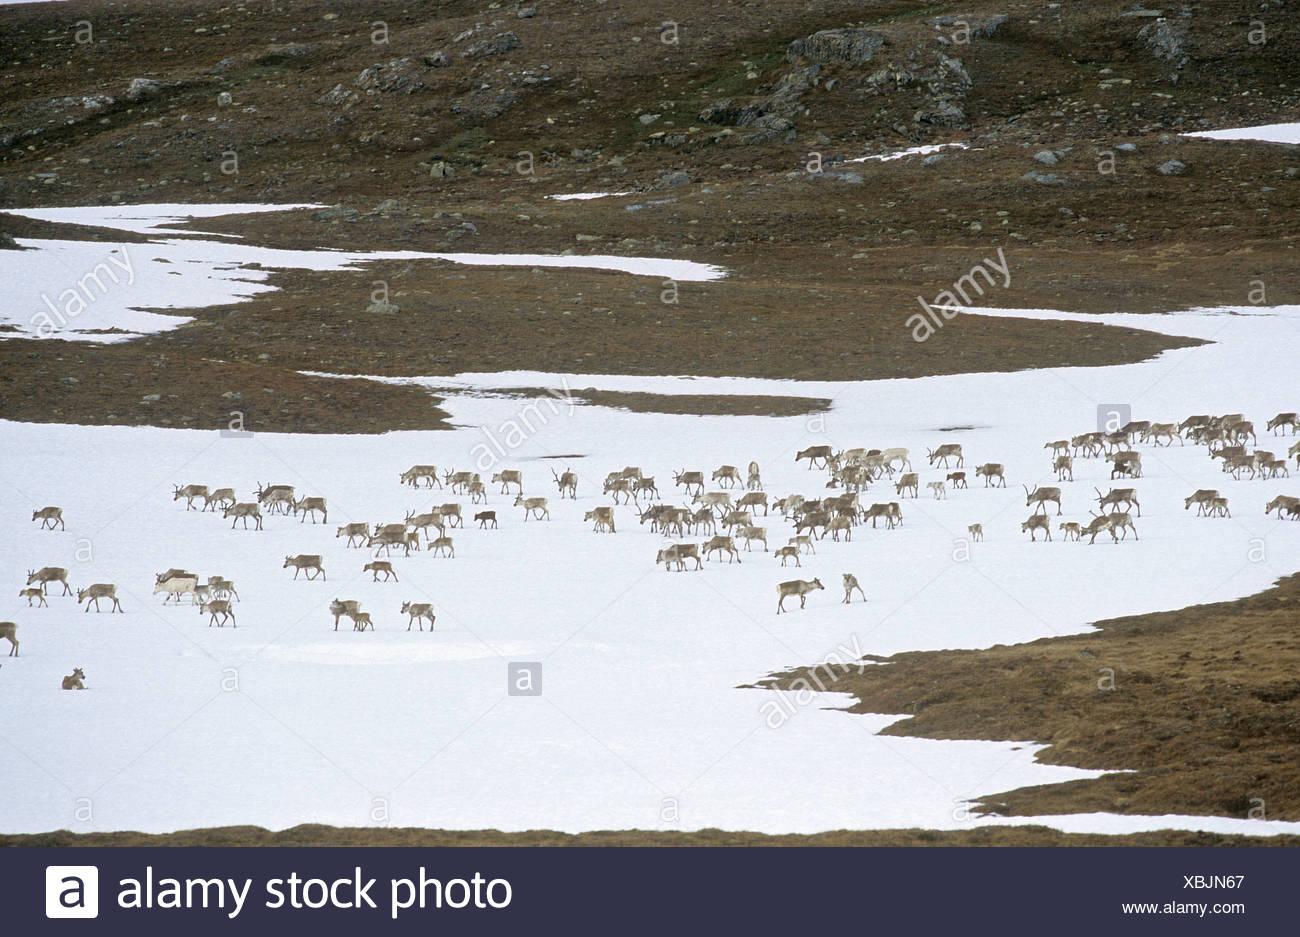 Reindeers on snowfield / Rangifer tarandus - Stock Image